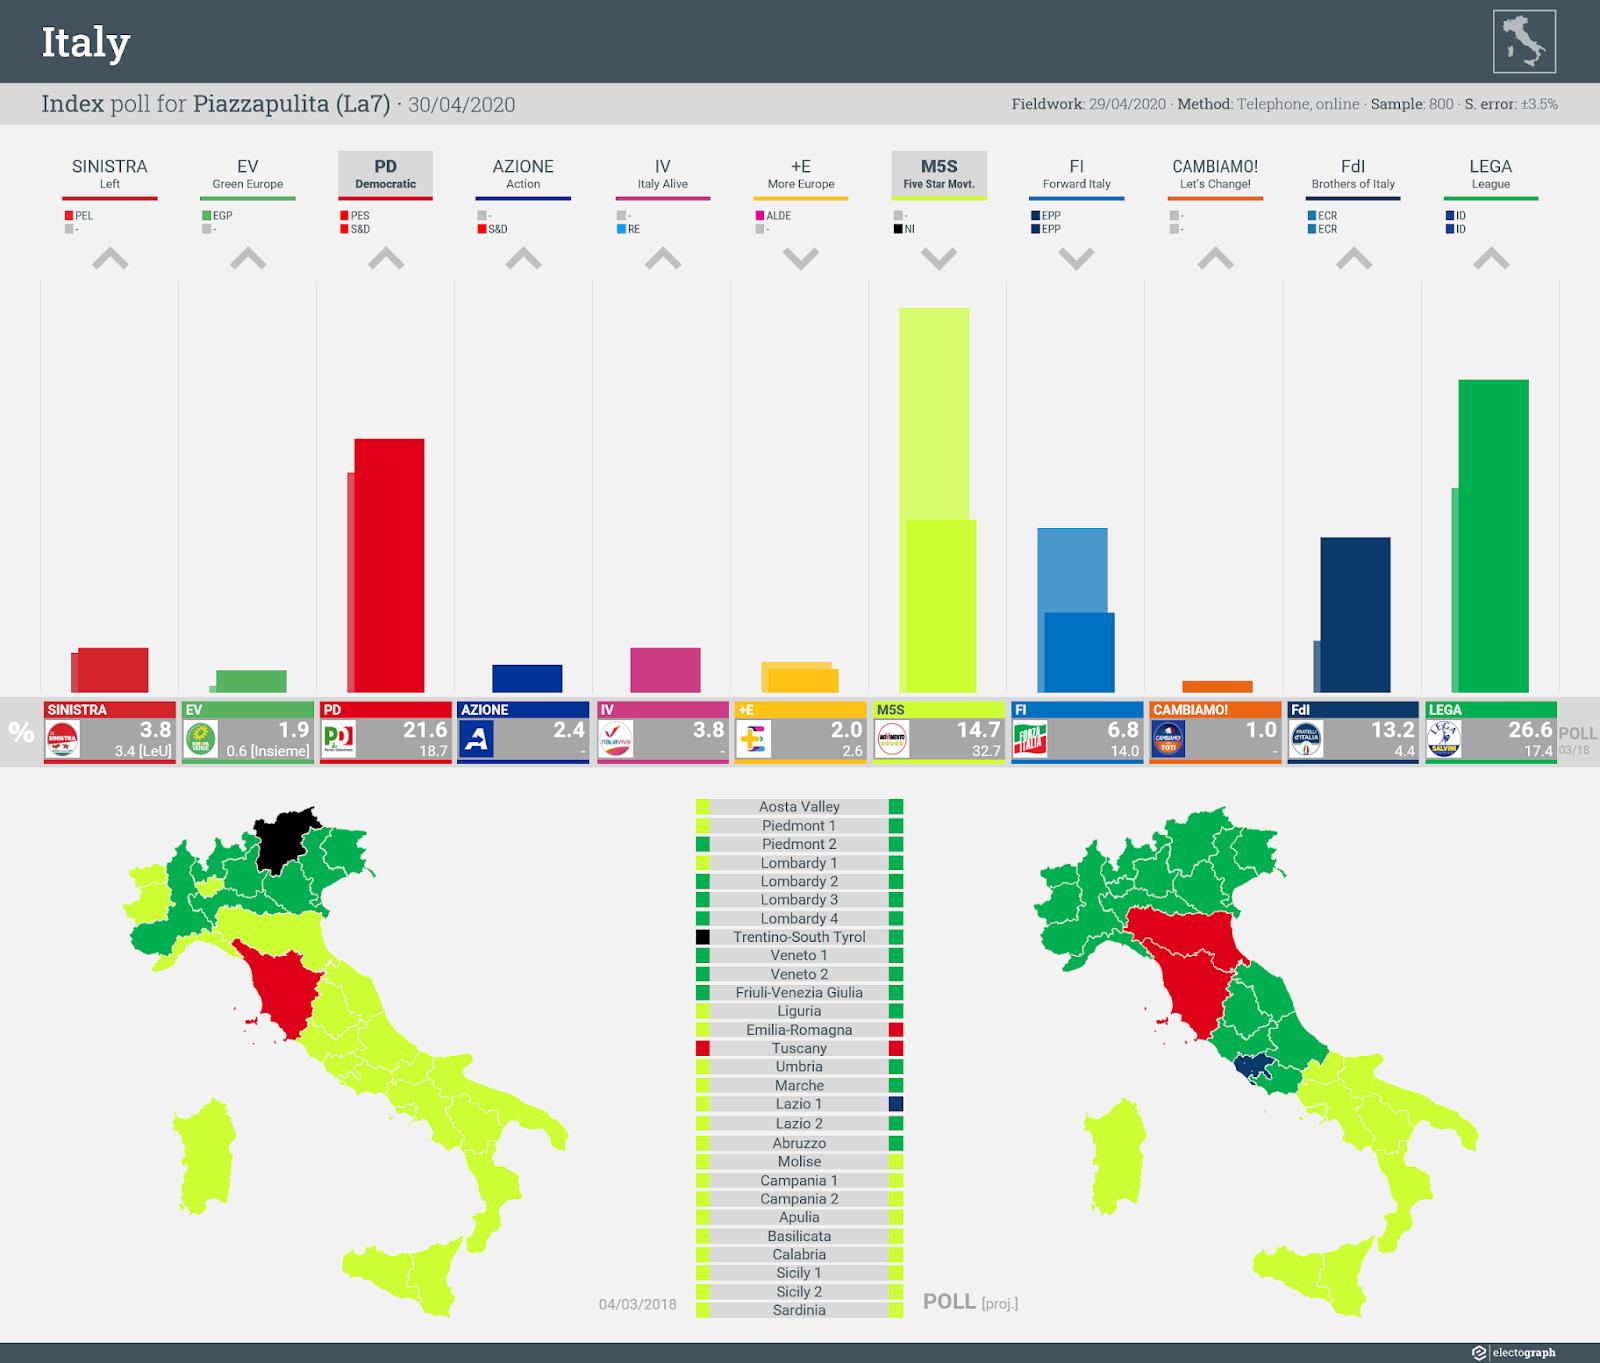 ITALY: Index poll chart for Piazzapulita (La7), 30 April 2020